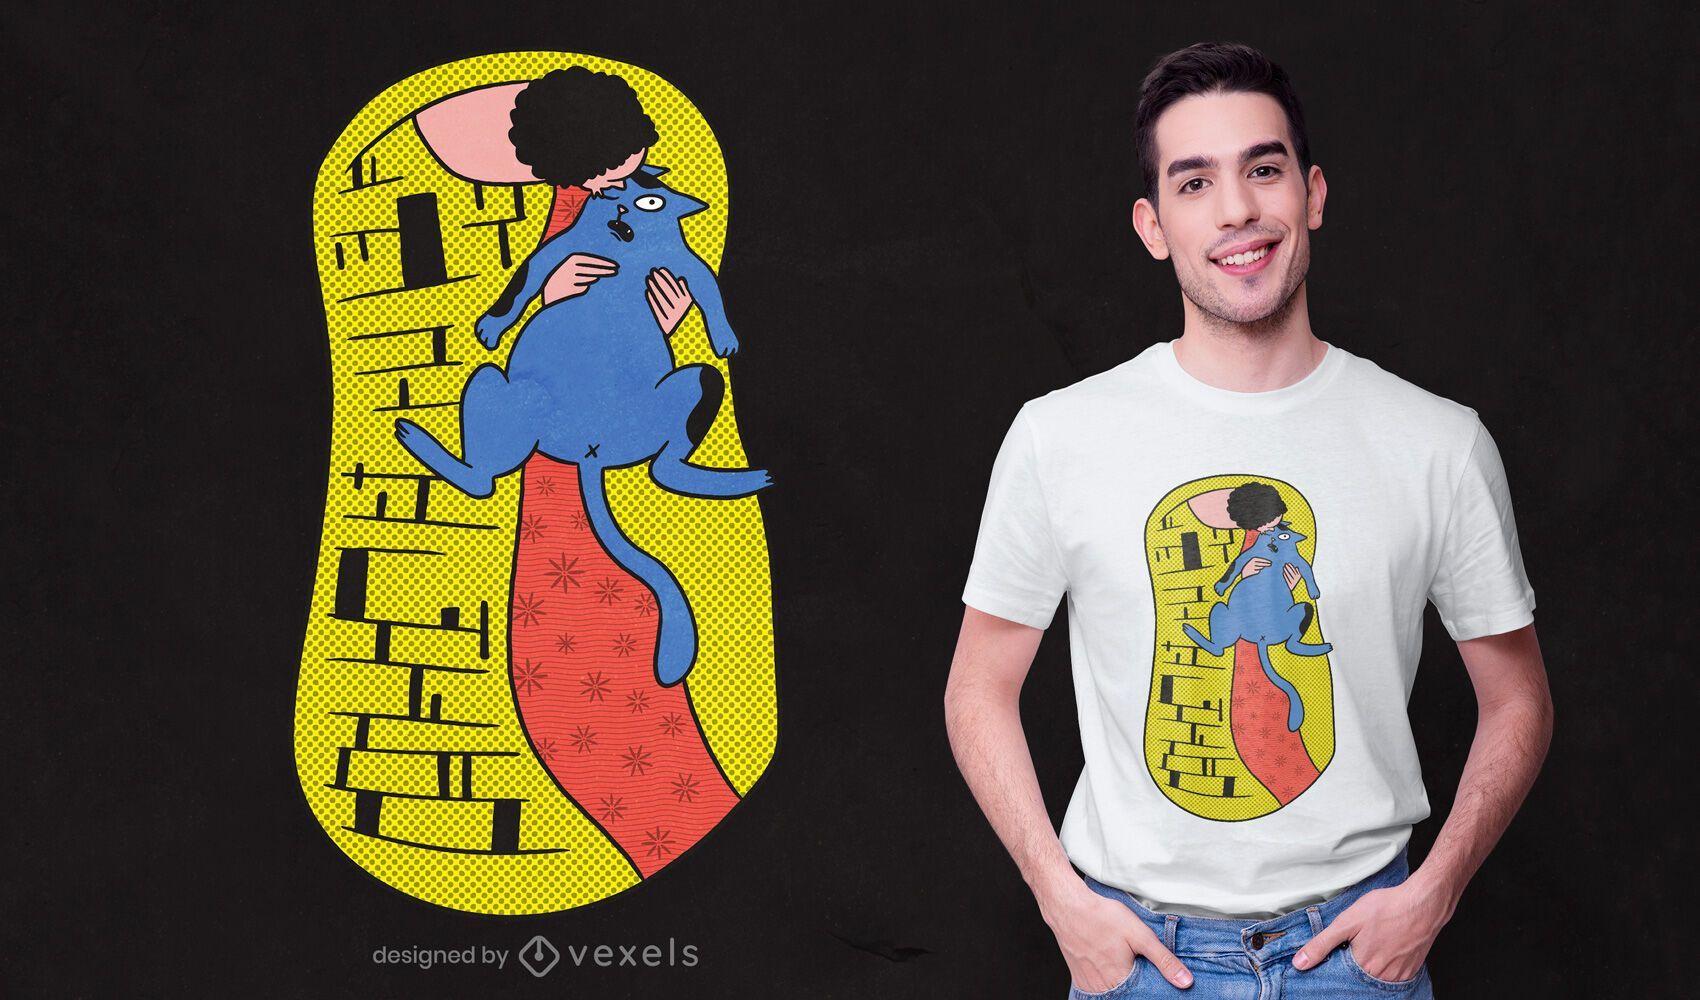 The kiss parody t-shirt design